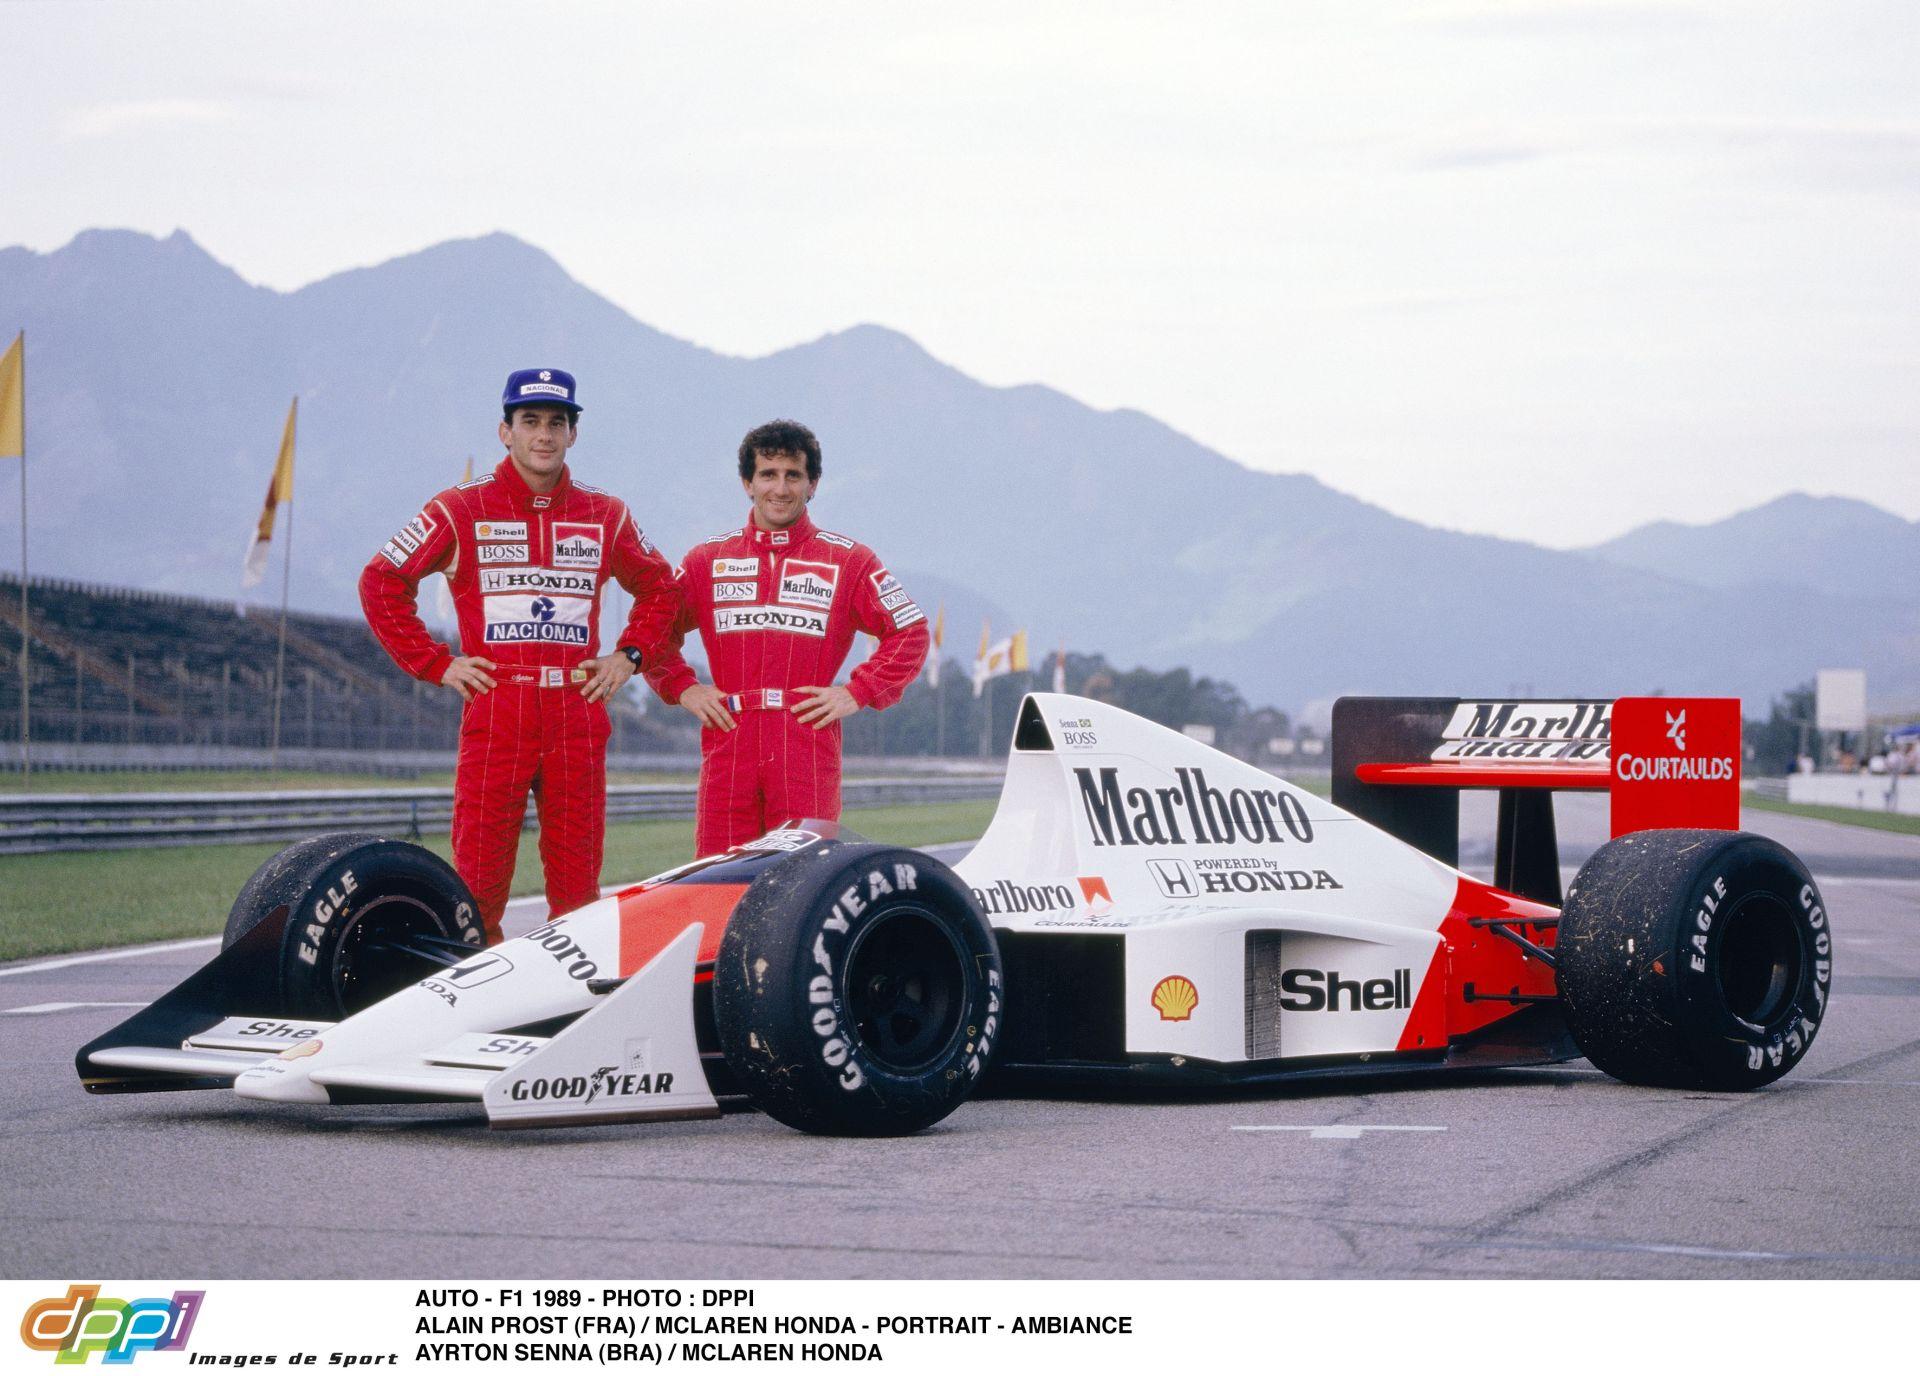 Ayrton Senna 1989-es köre Suzukából James Hunt kommentálásában